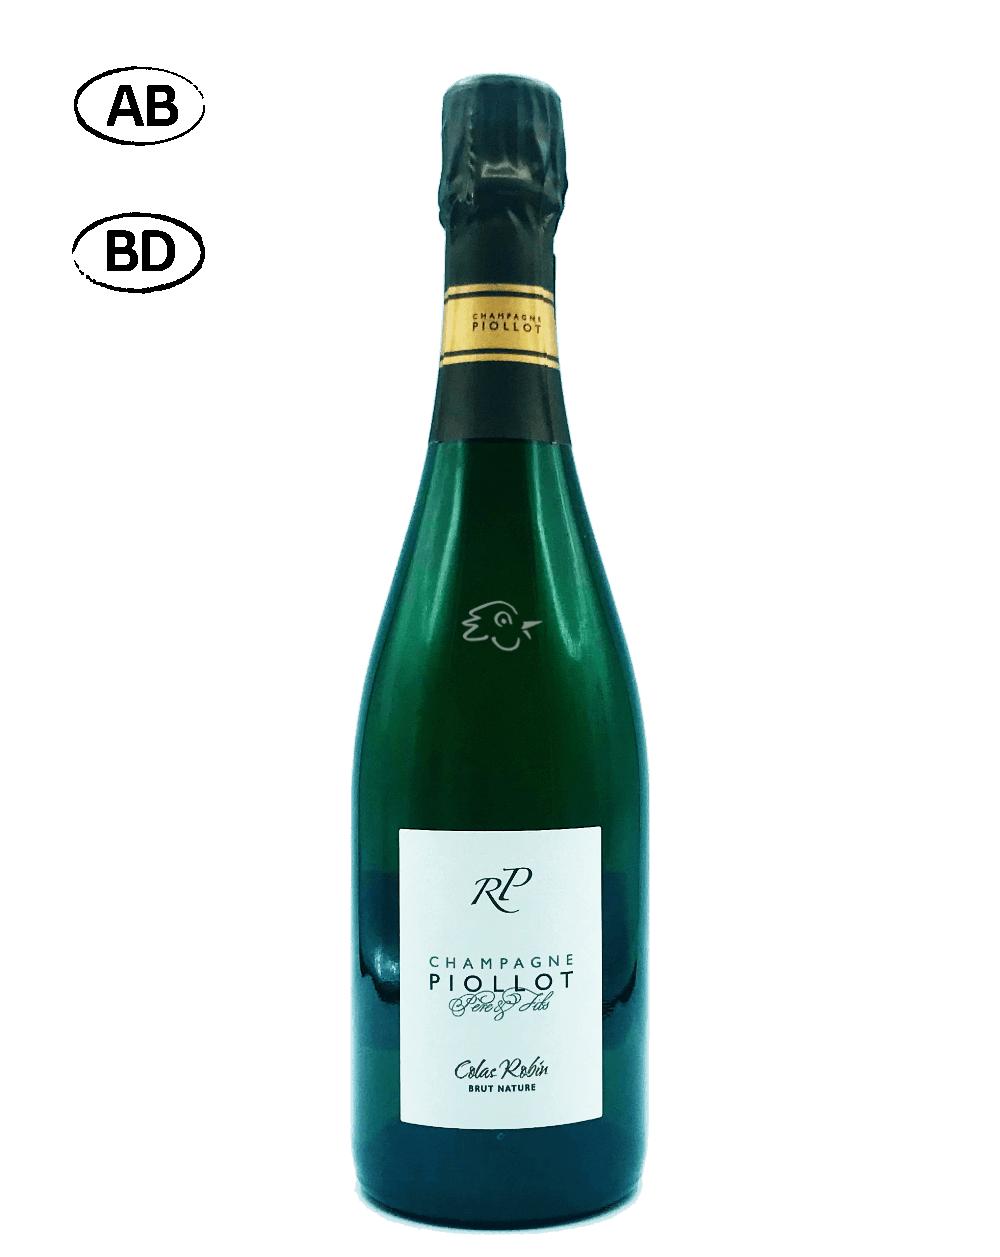 'Pinot Blanc' Colas Robin - Champagne Piollot - Avintures